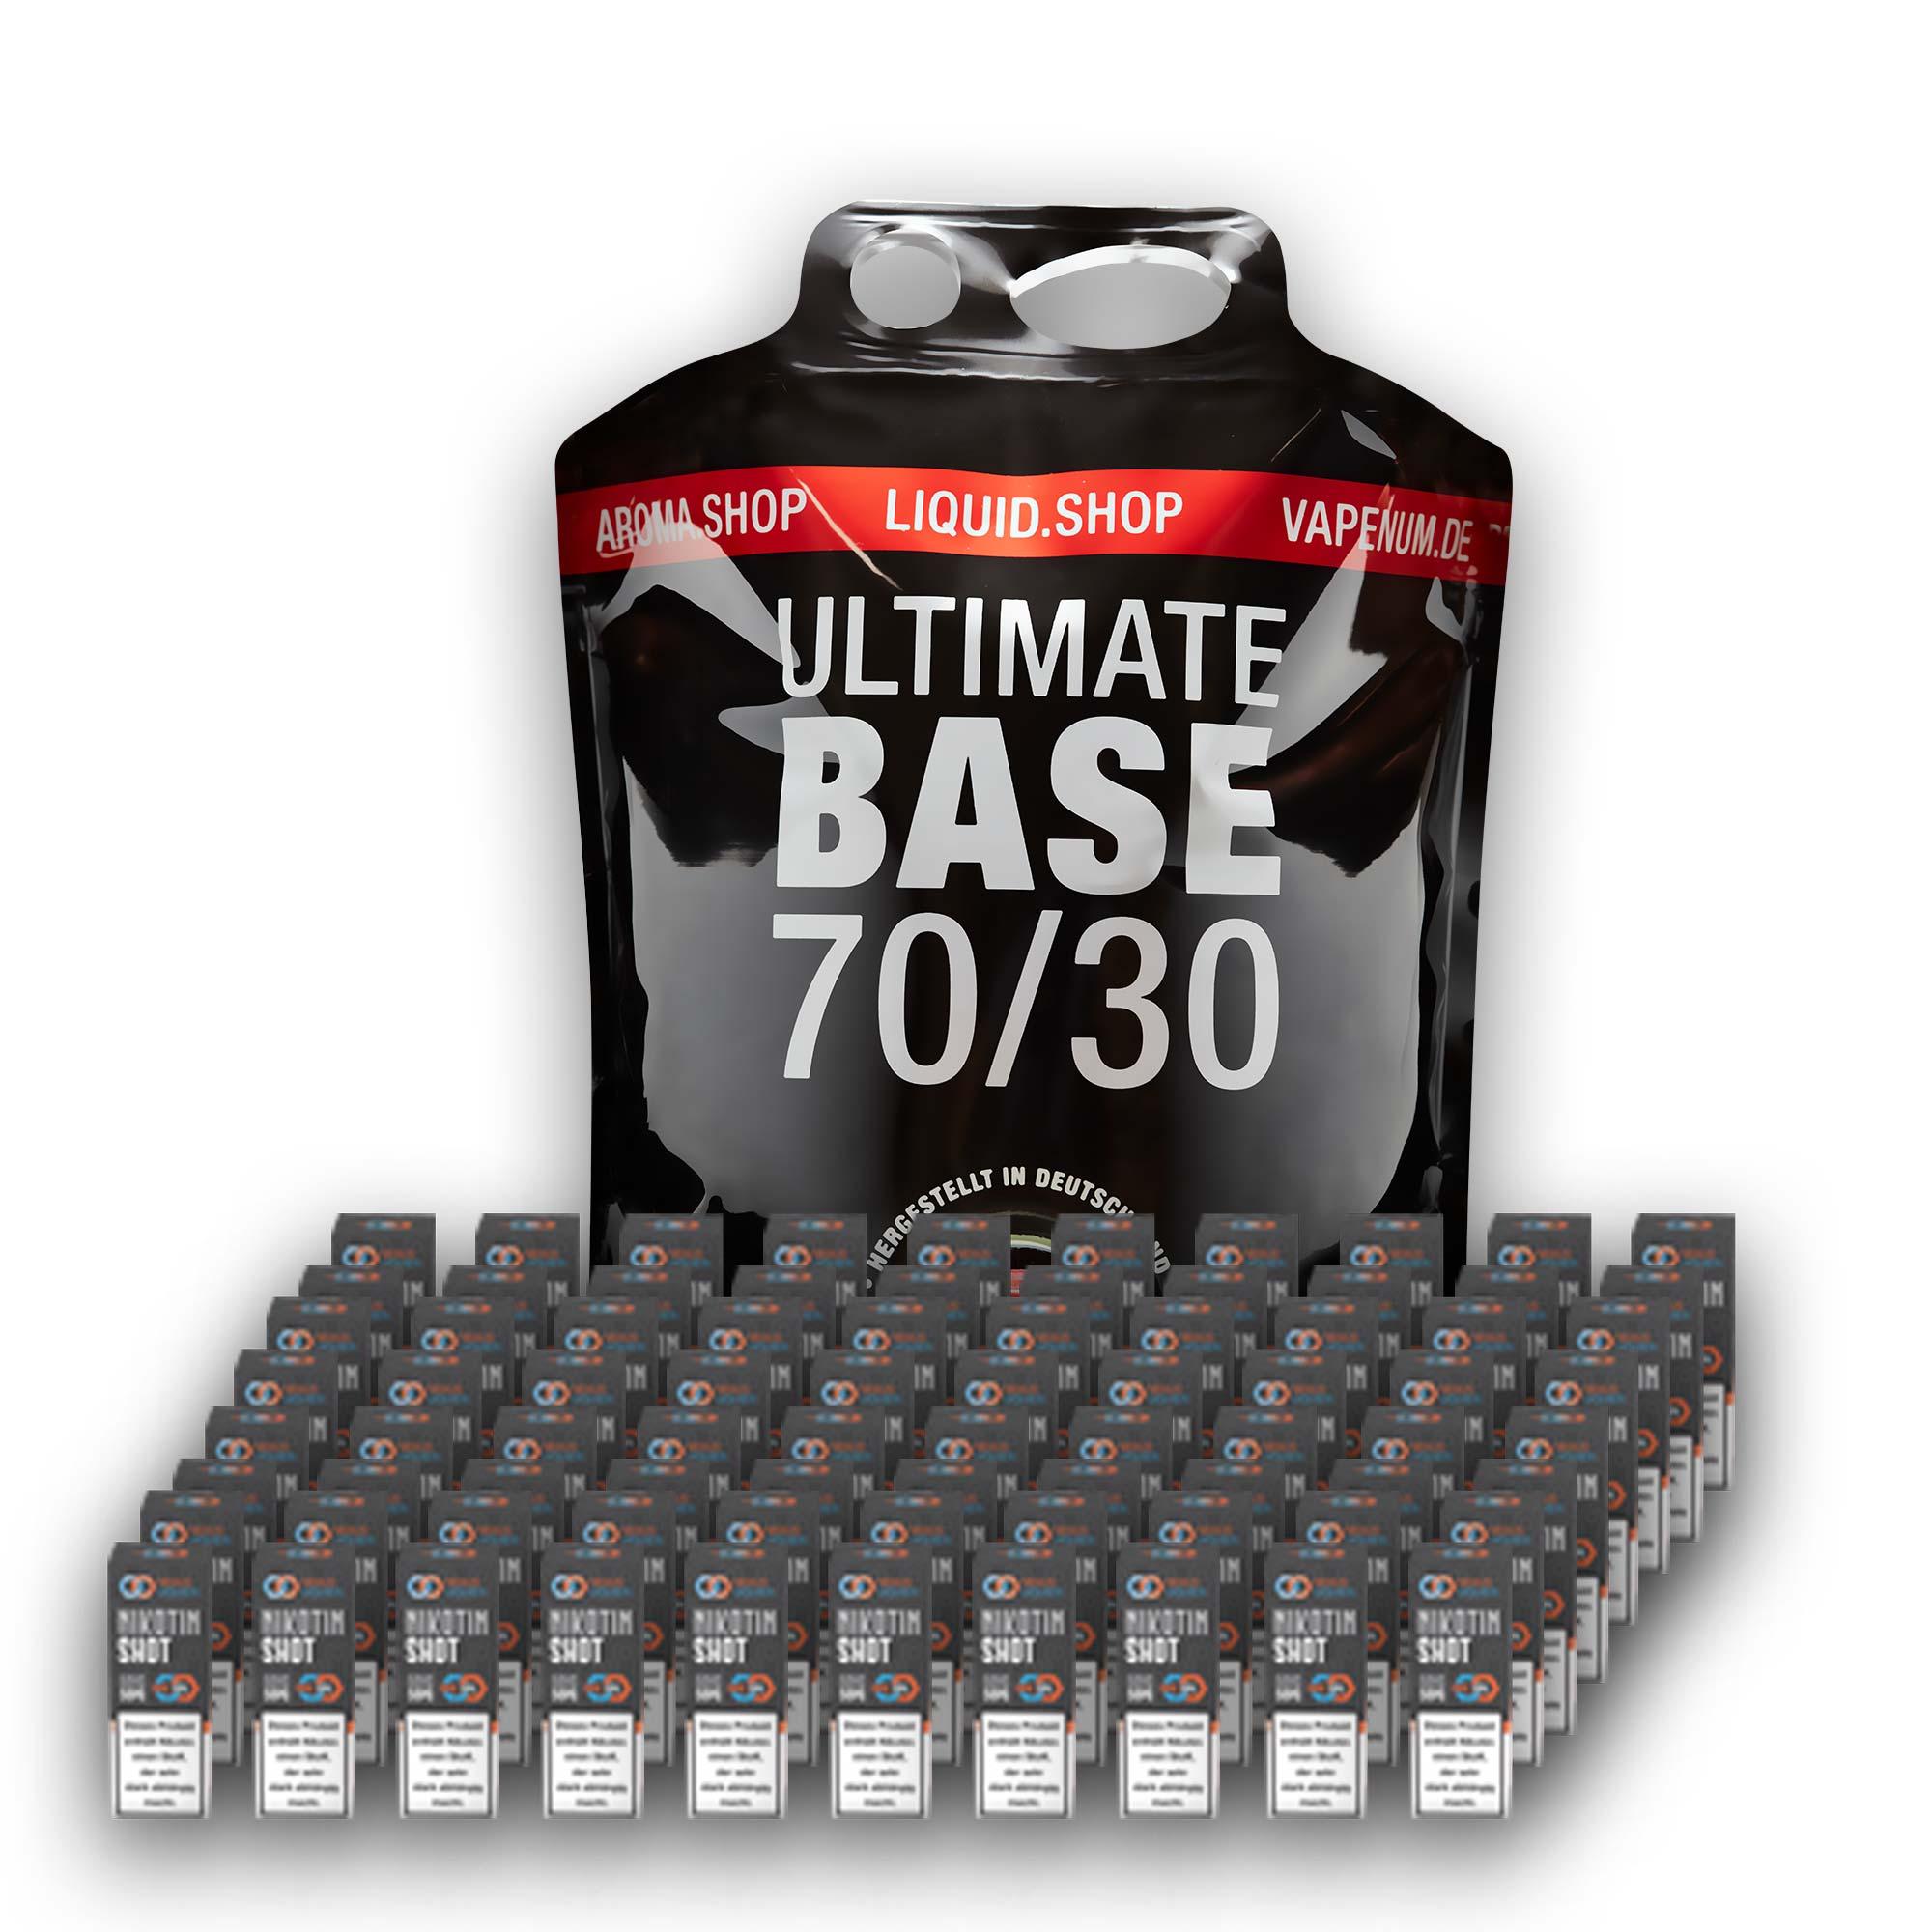 3L Ultimate Base (70/30) inklusive 80 Nik Shots 18mg